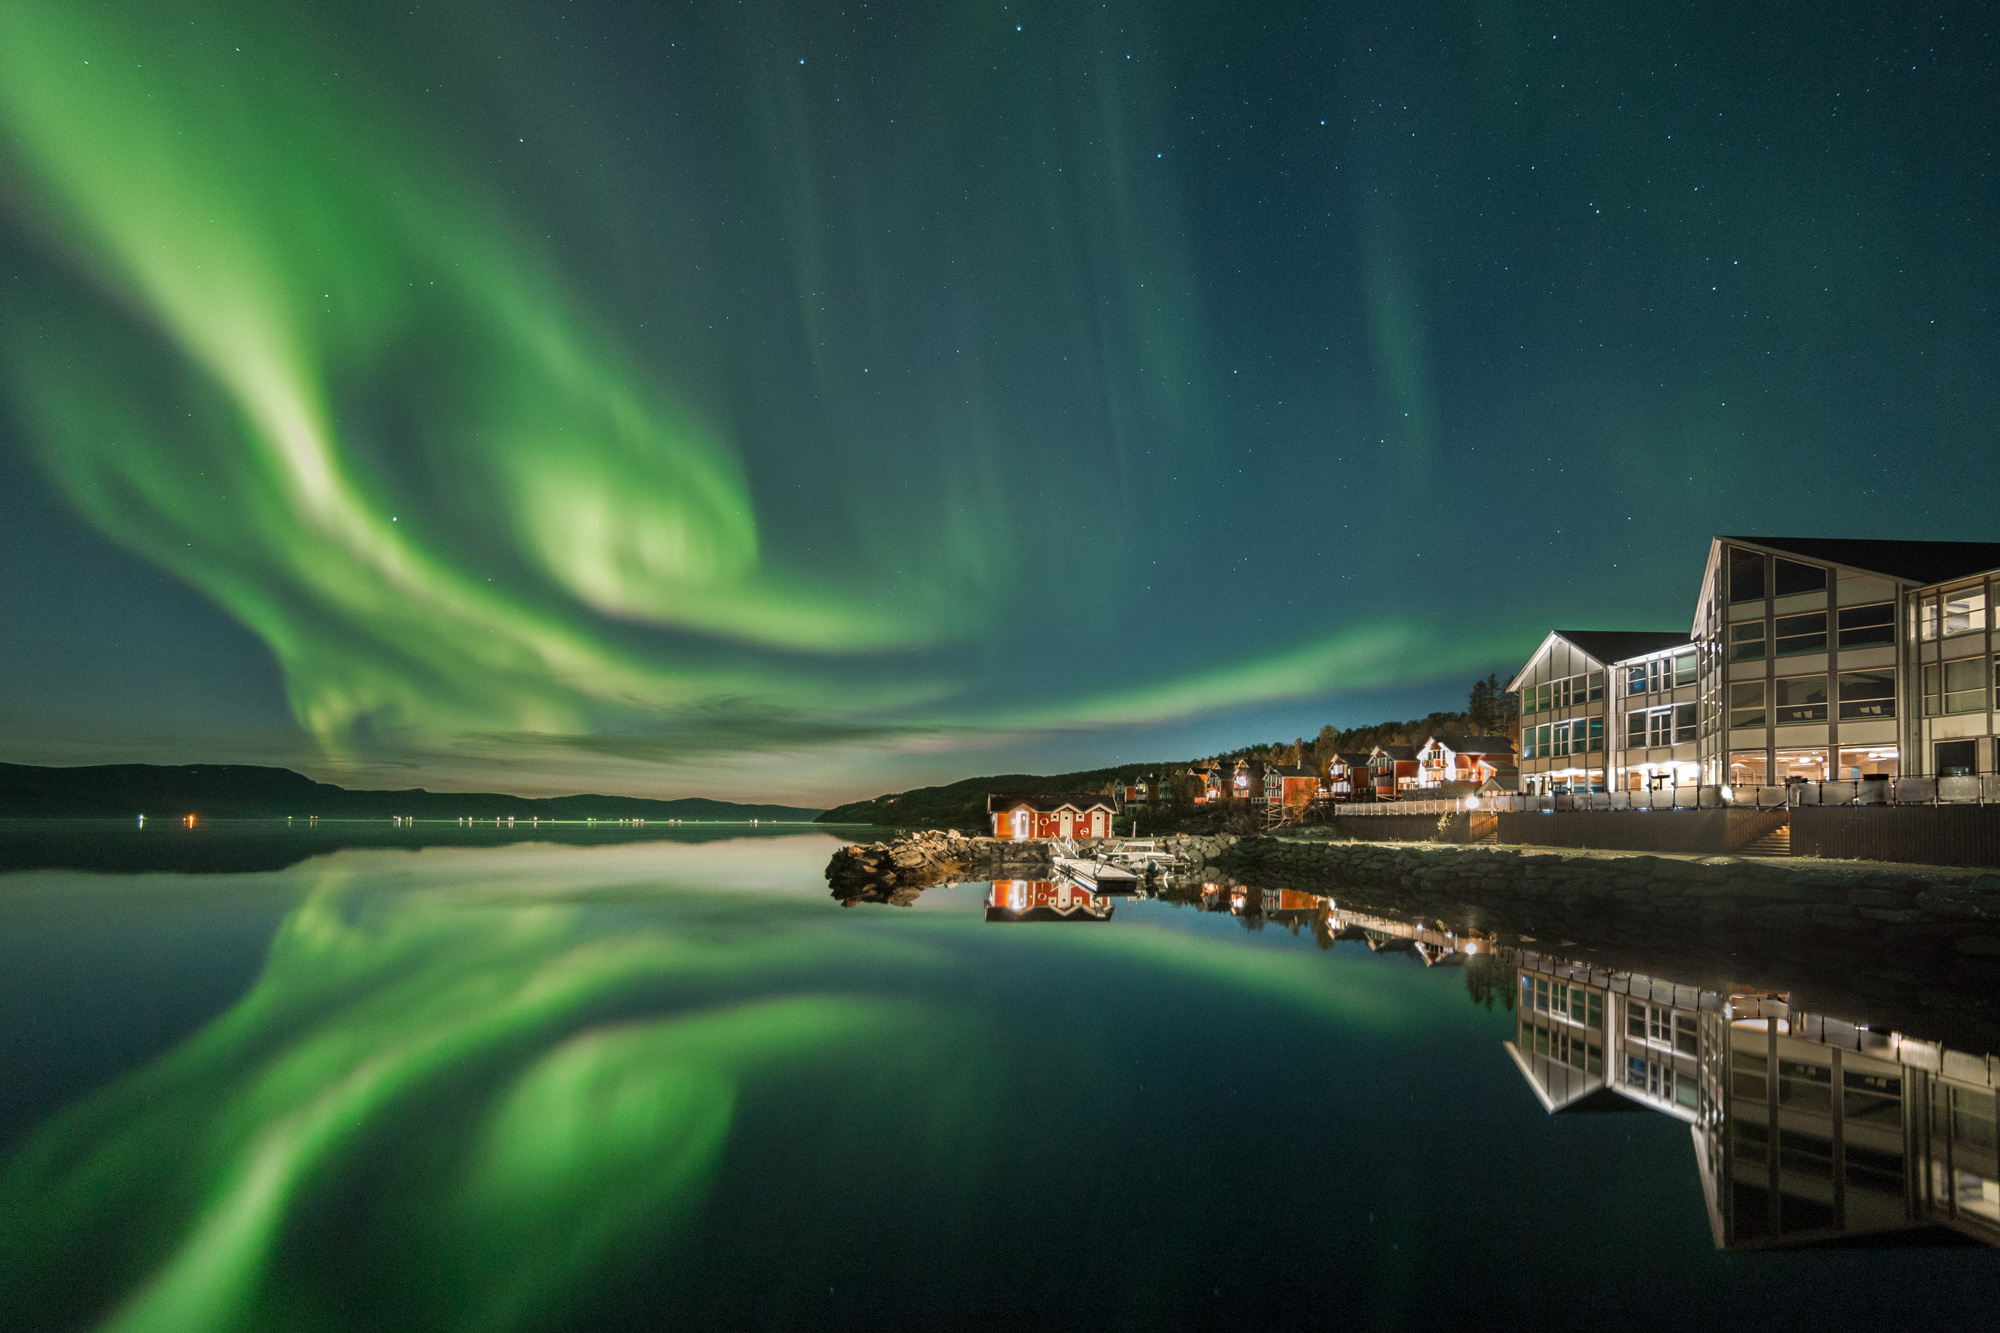 northern norway malangen resort aurora over fjord